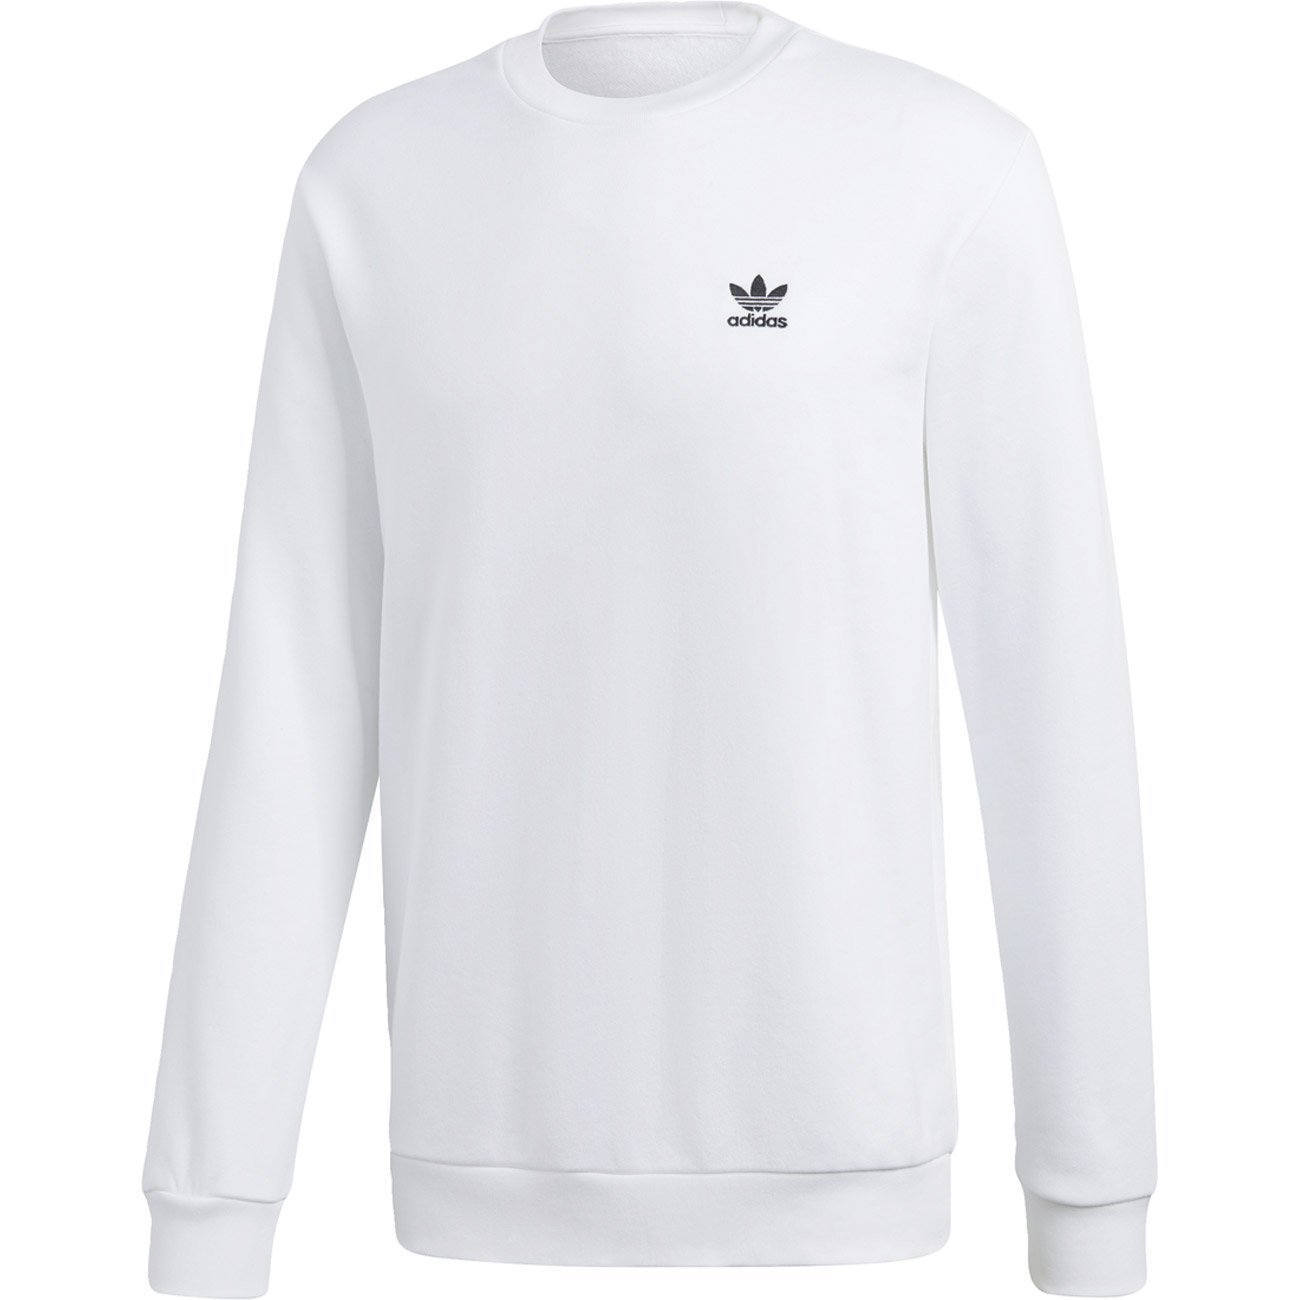 Trettmann Adidas Pullover weiß